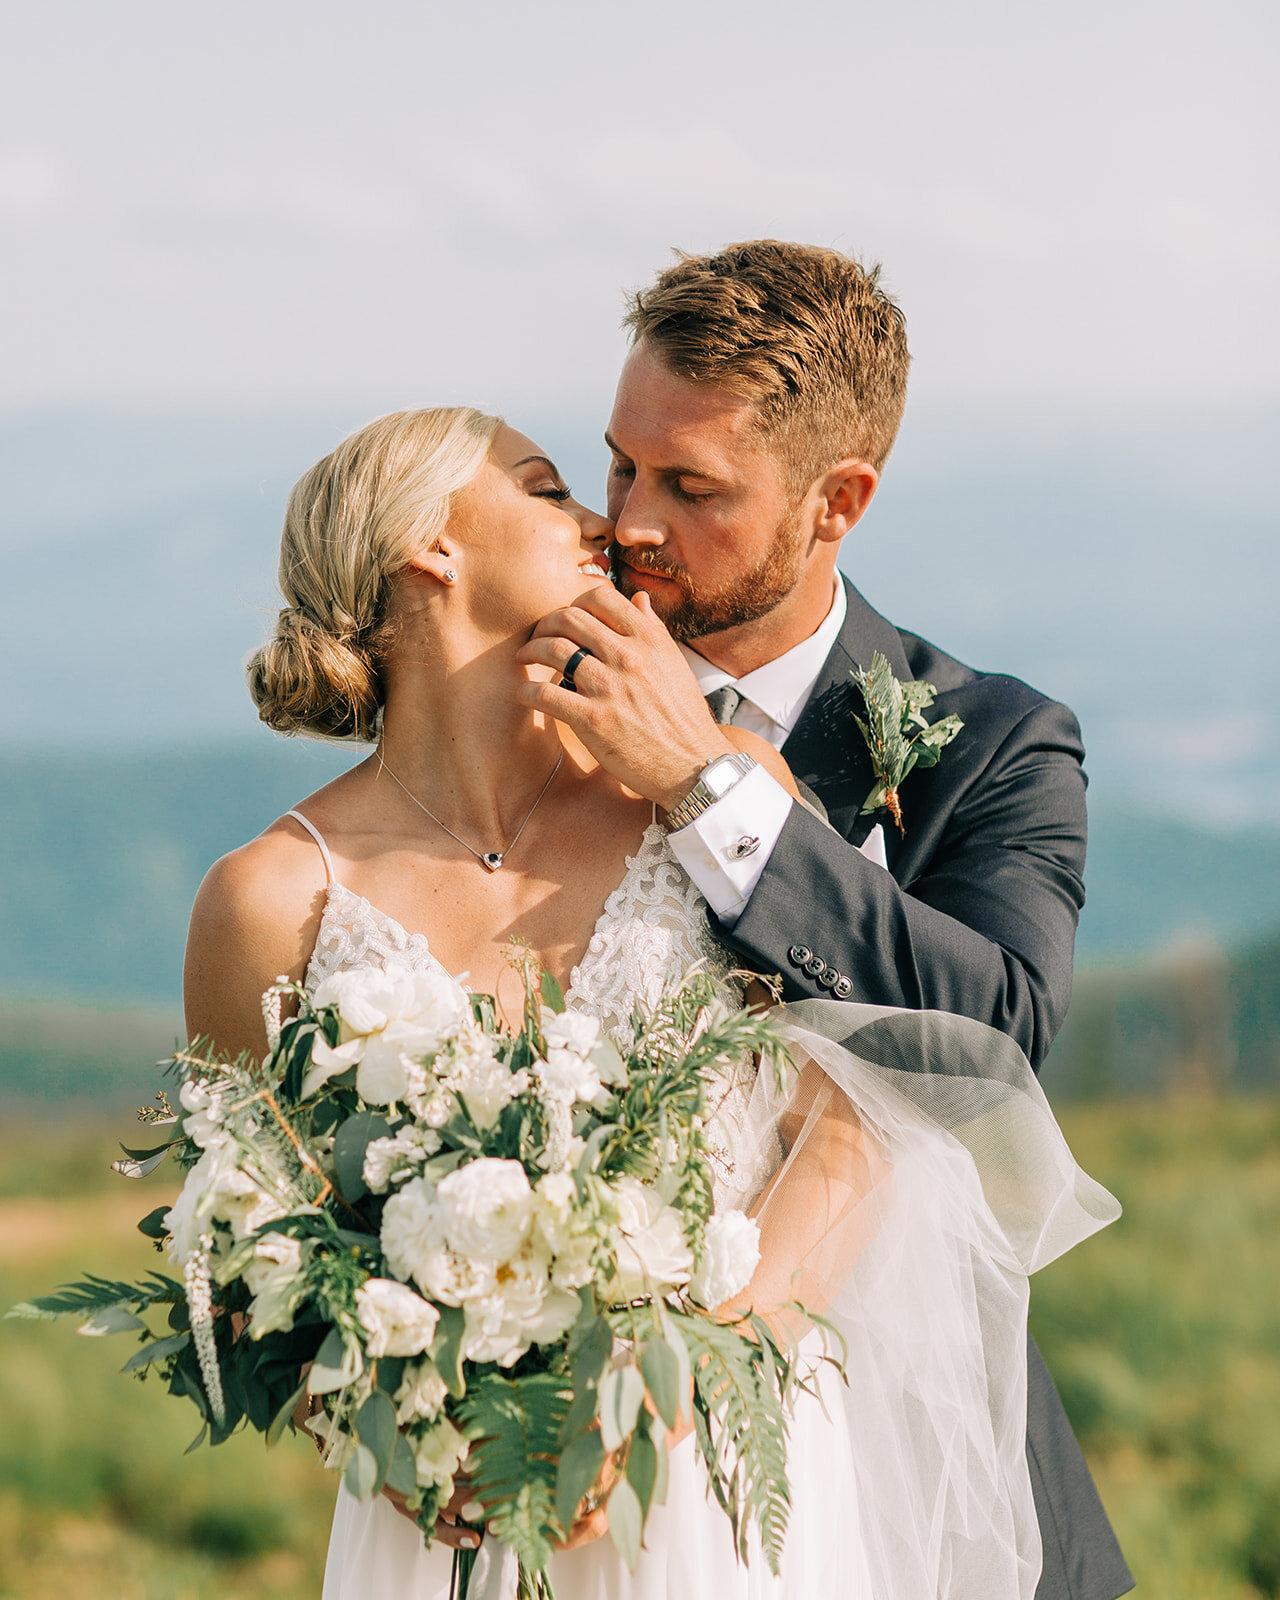 close up spokane bride and groom wedding portraits